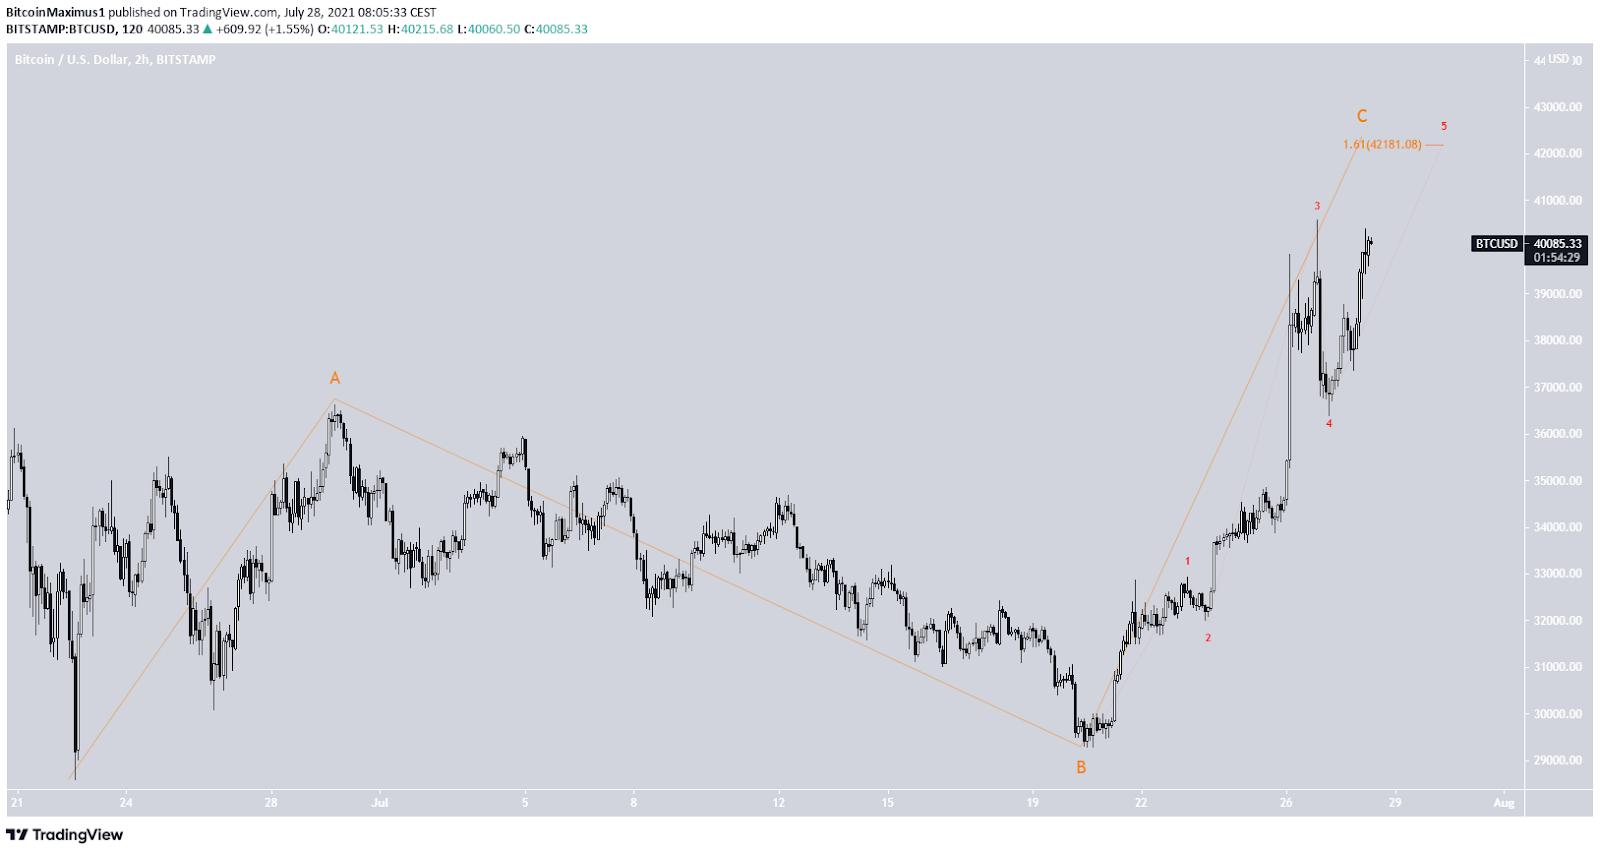 Bitcoin Preis Kurs BTC Wellenanalye 28.07.2021